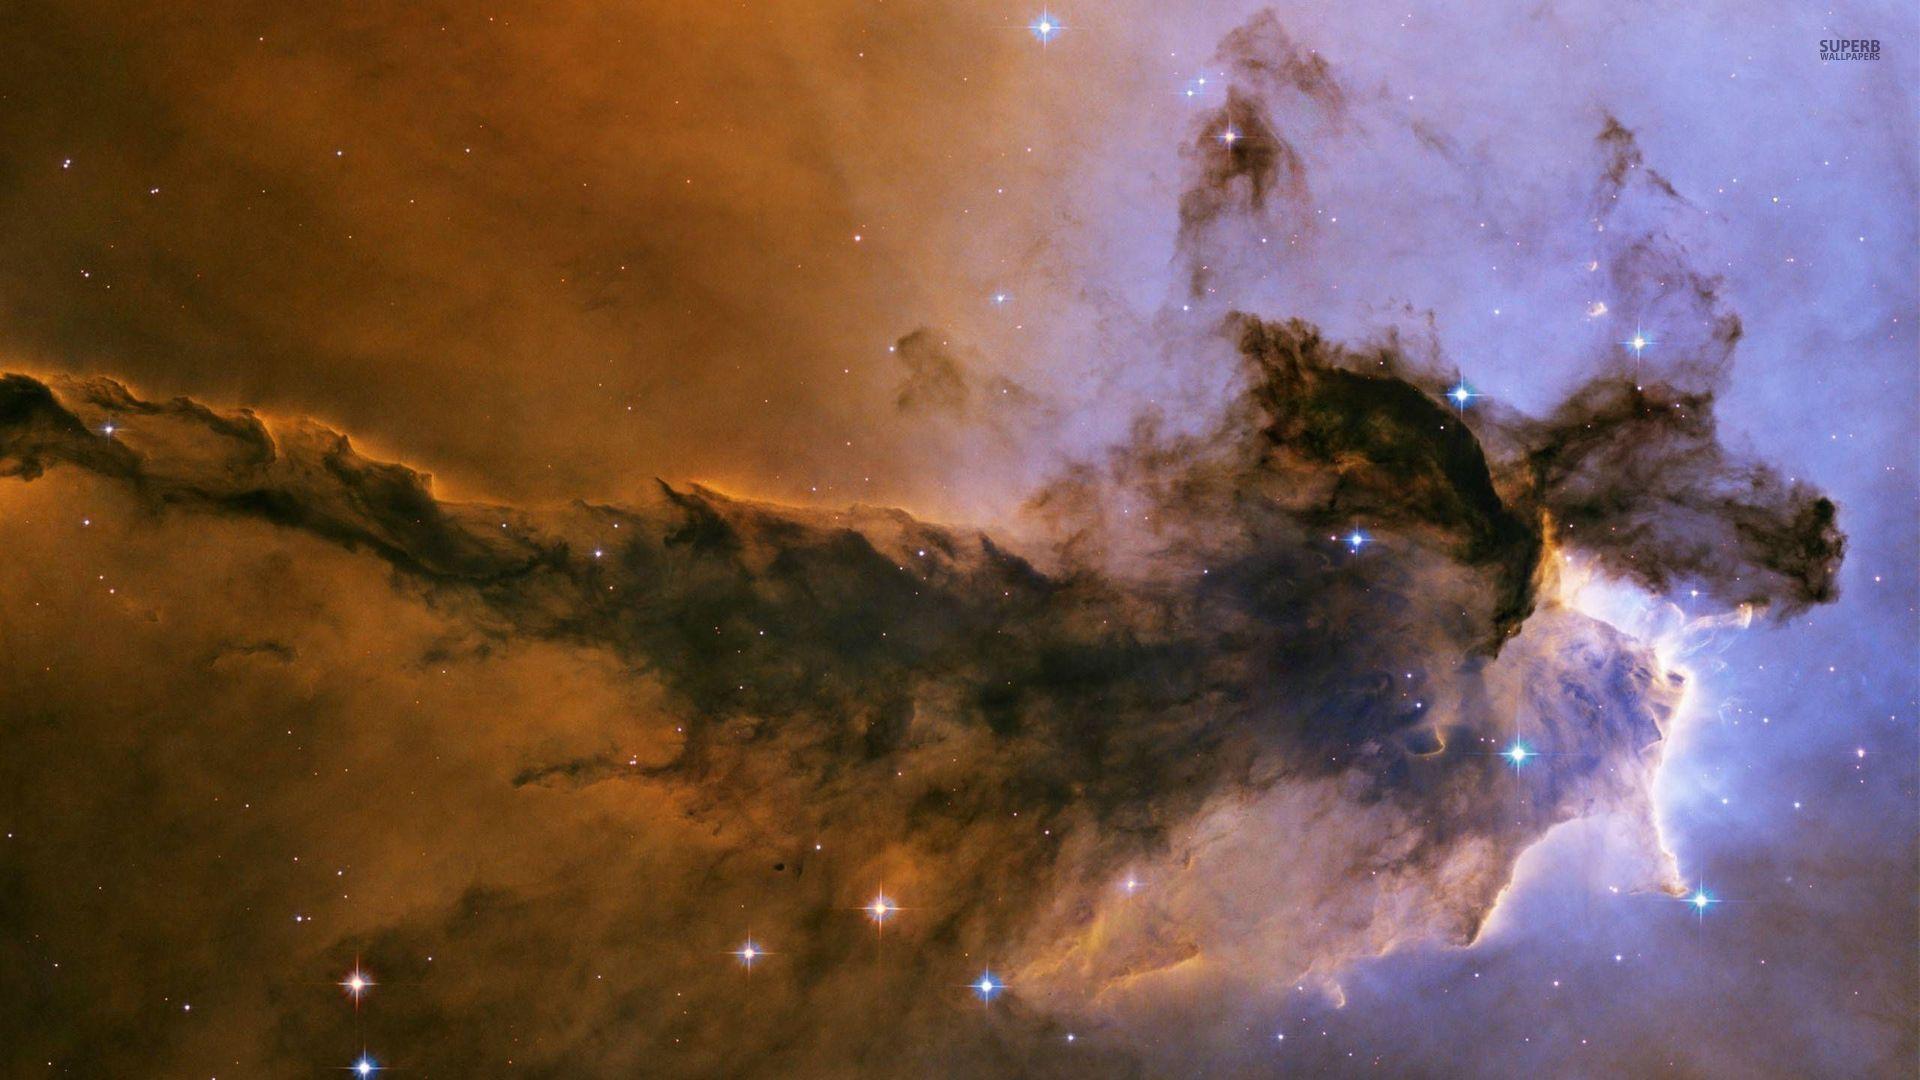 Eagle nebula deo 39 s happy little blog - Pillars of creation wallpaper ...